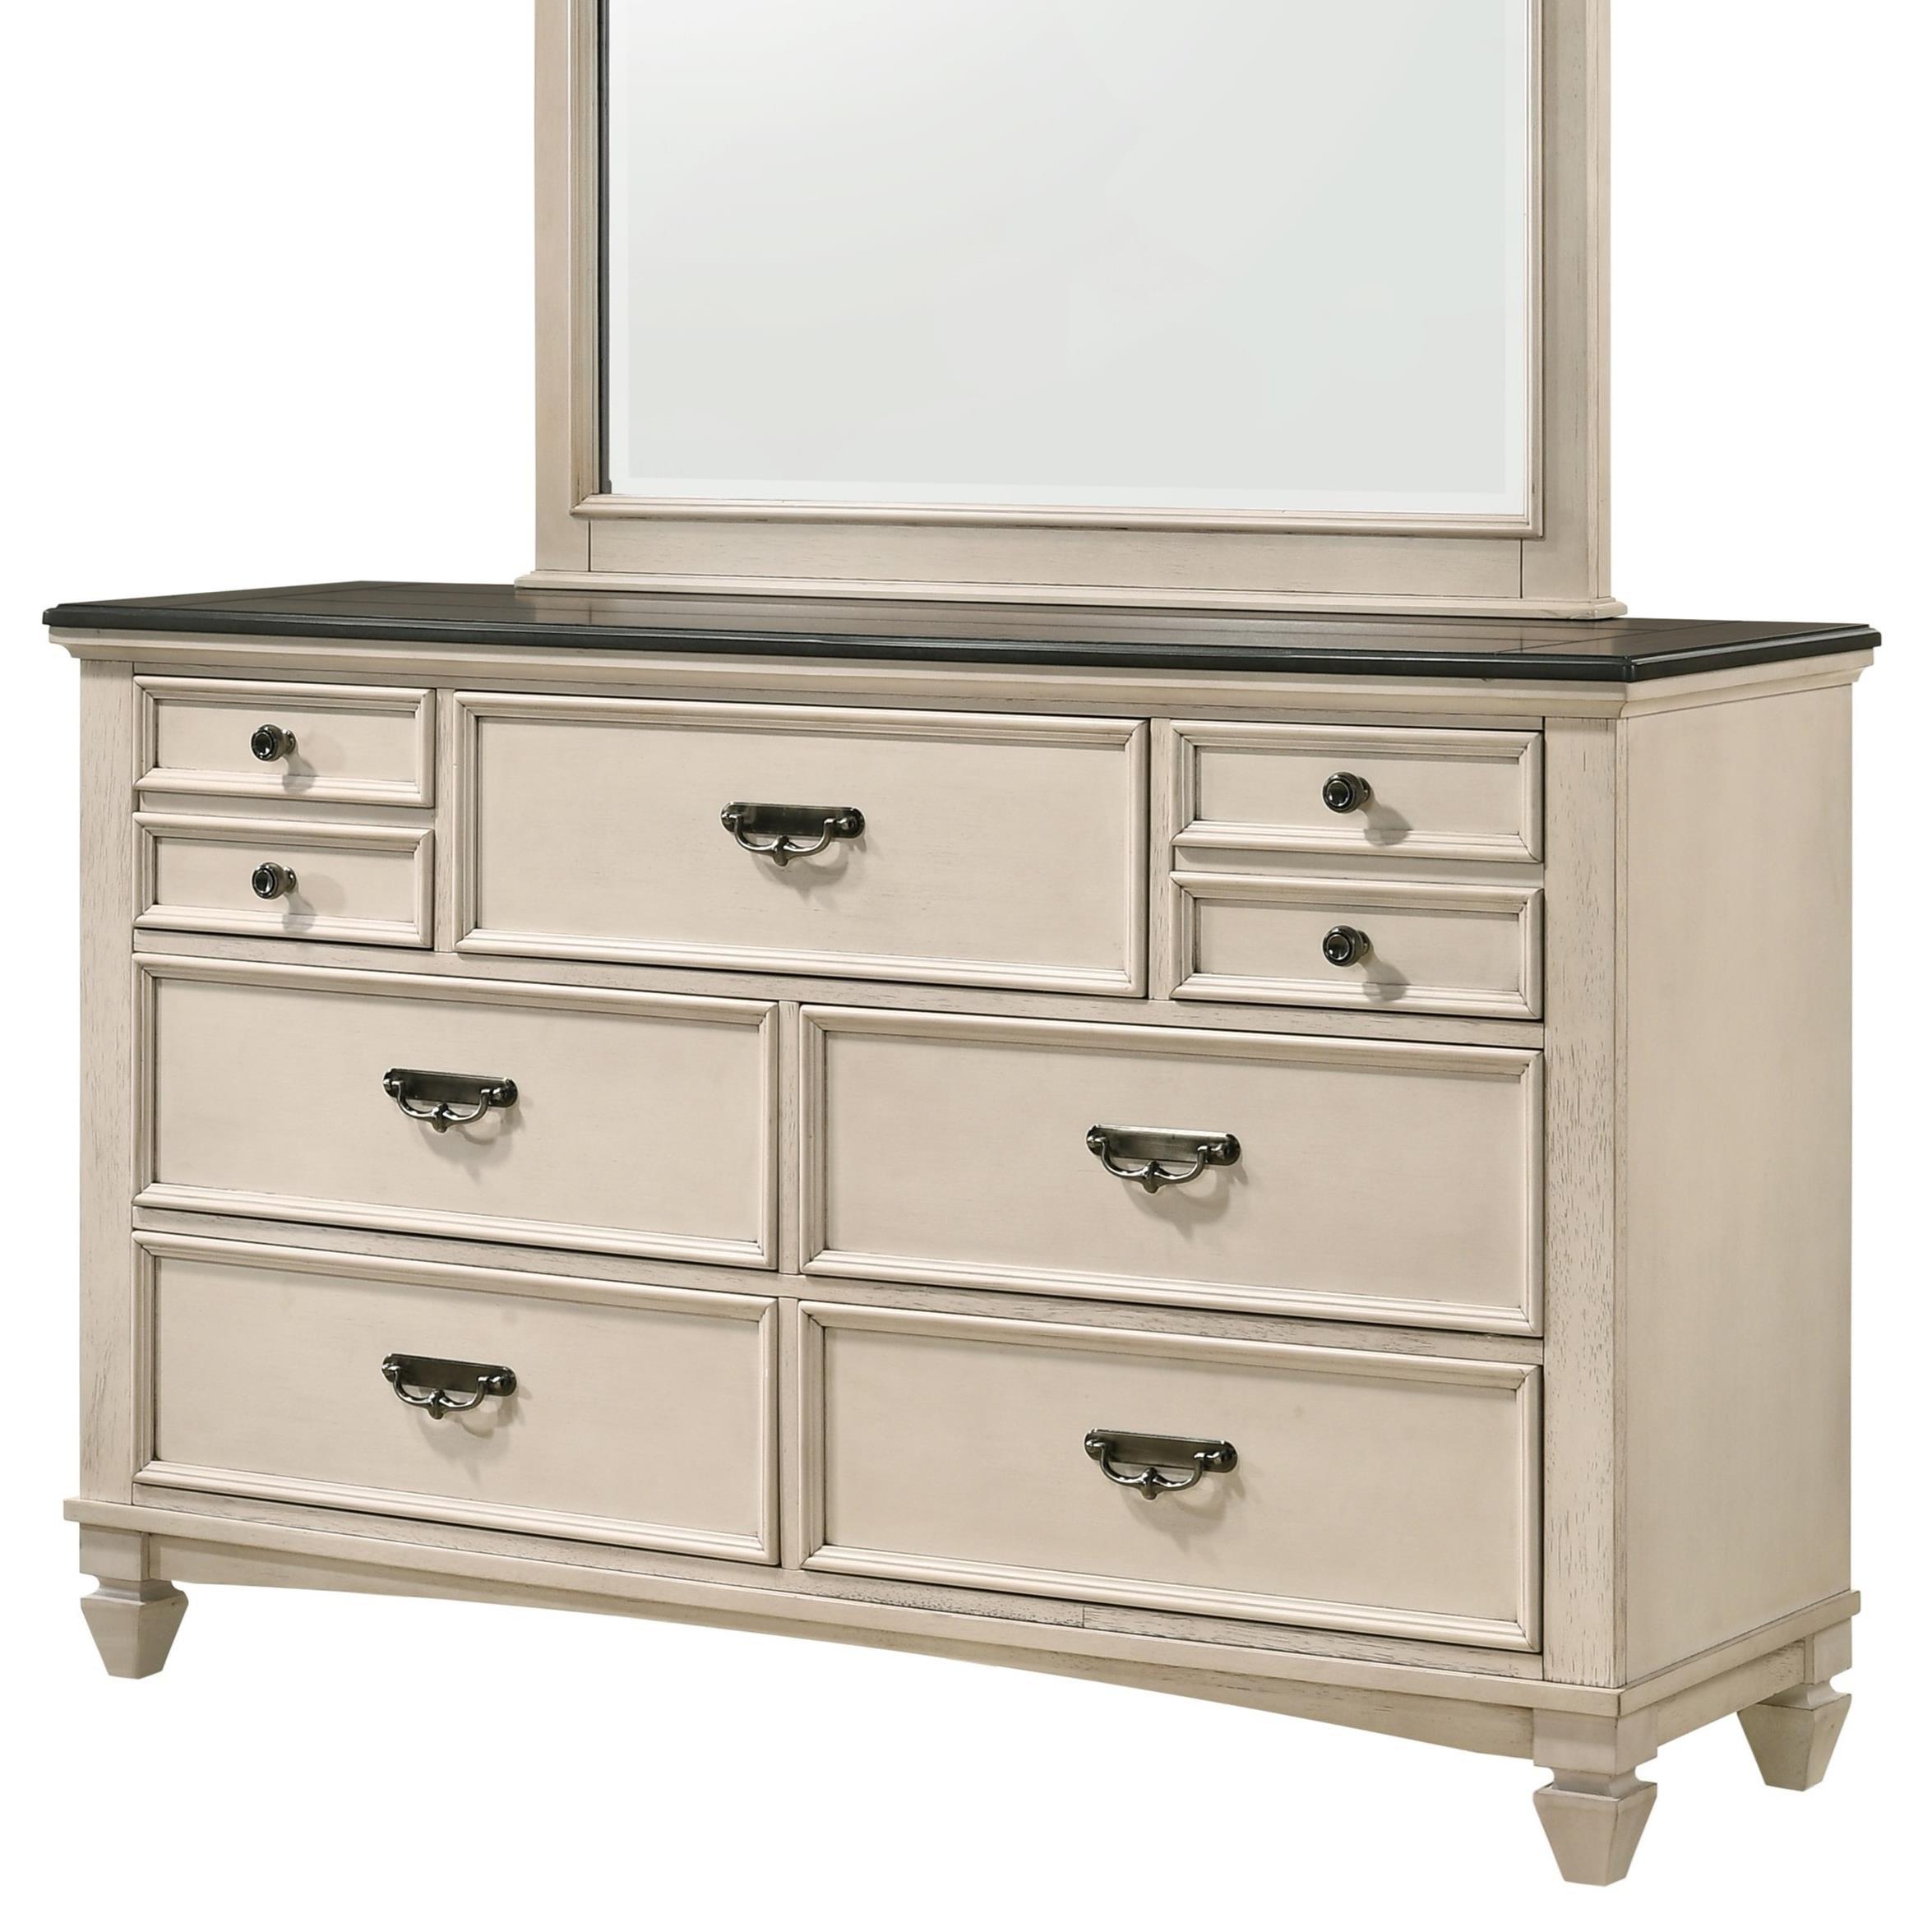 Sawyer Dresser by Crown Mark at Northeast Factory Direct